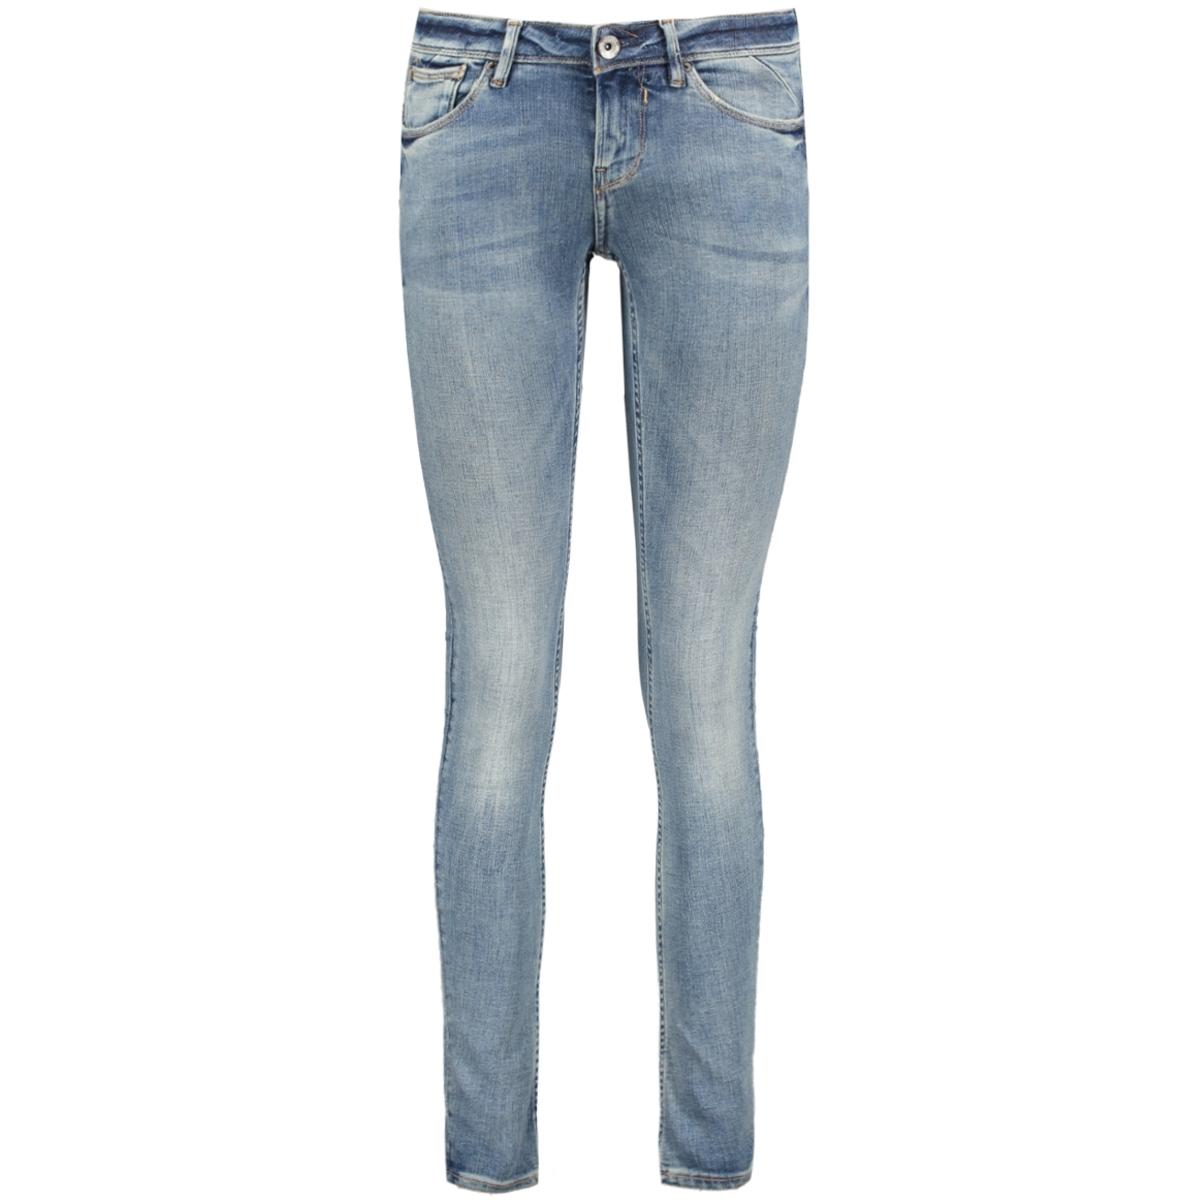 203/32 riva garcia jeans 2251 retro power